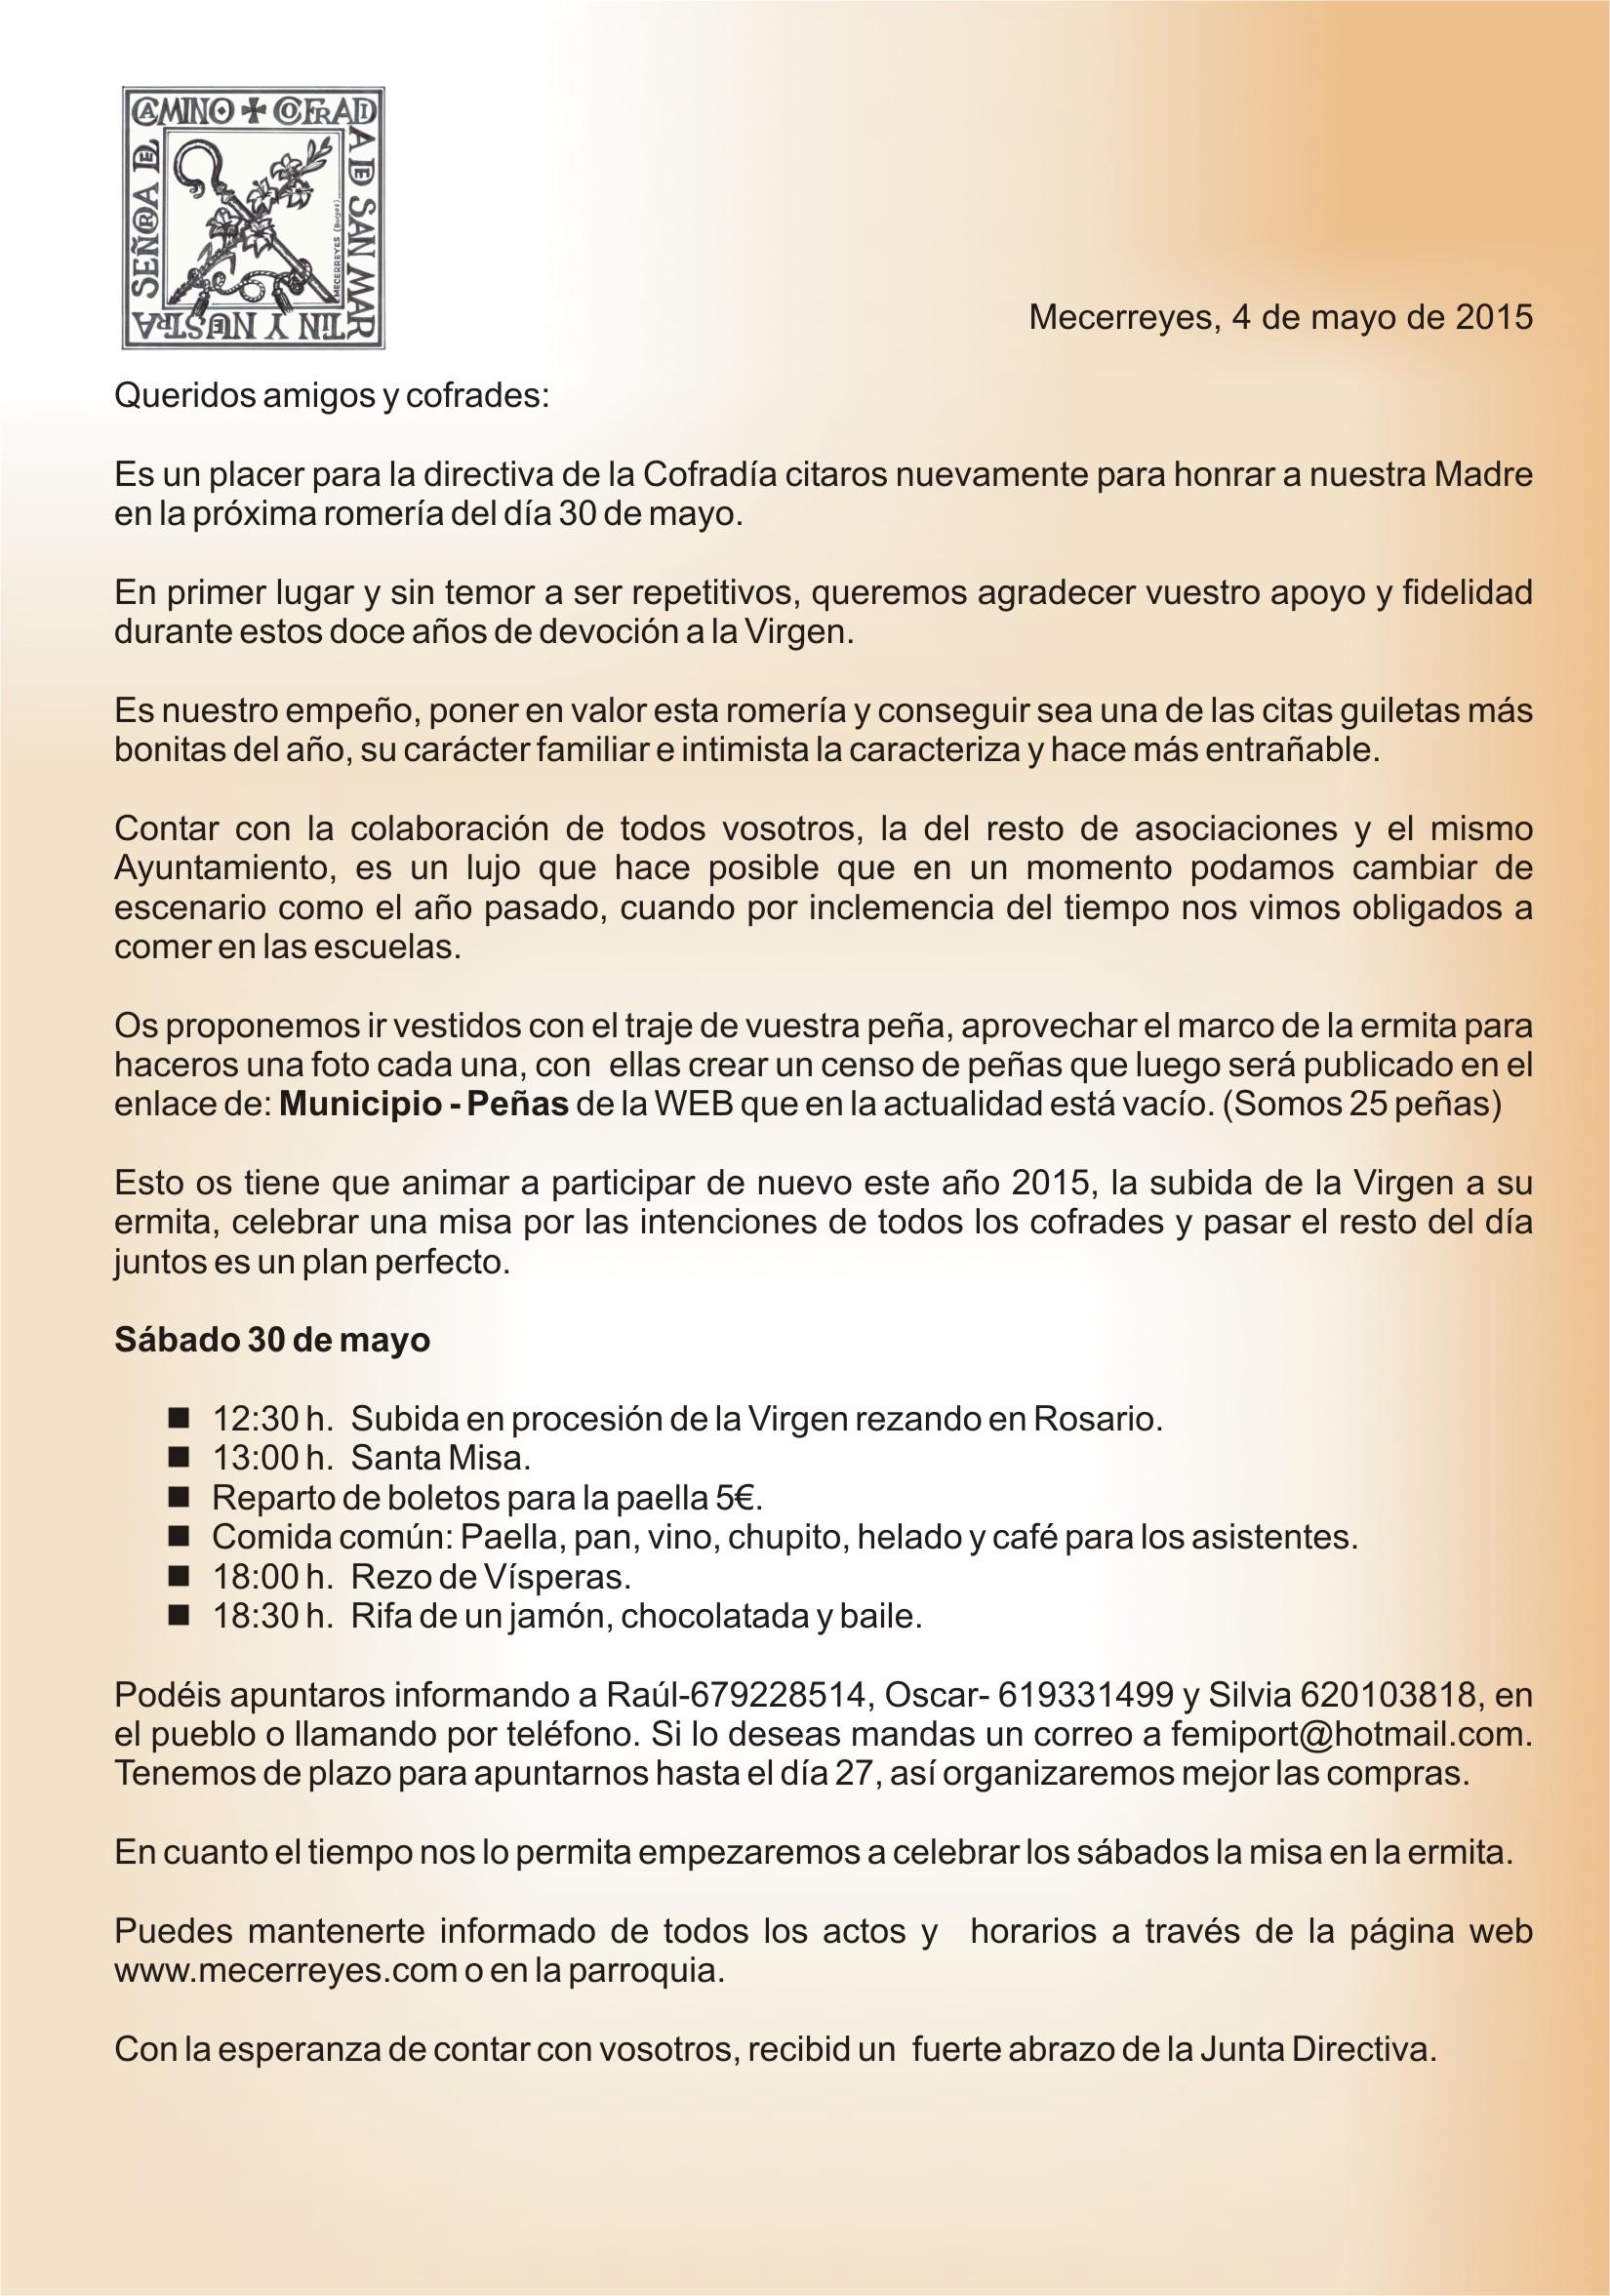 Mecerreyes, Carta Romería Mayo 2015